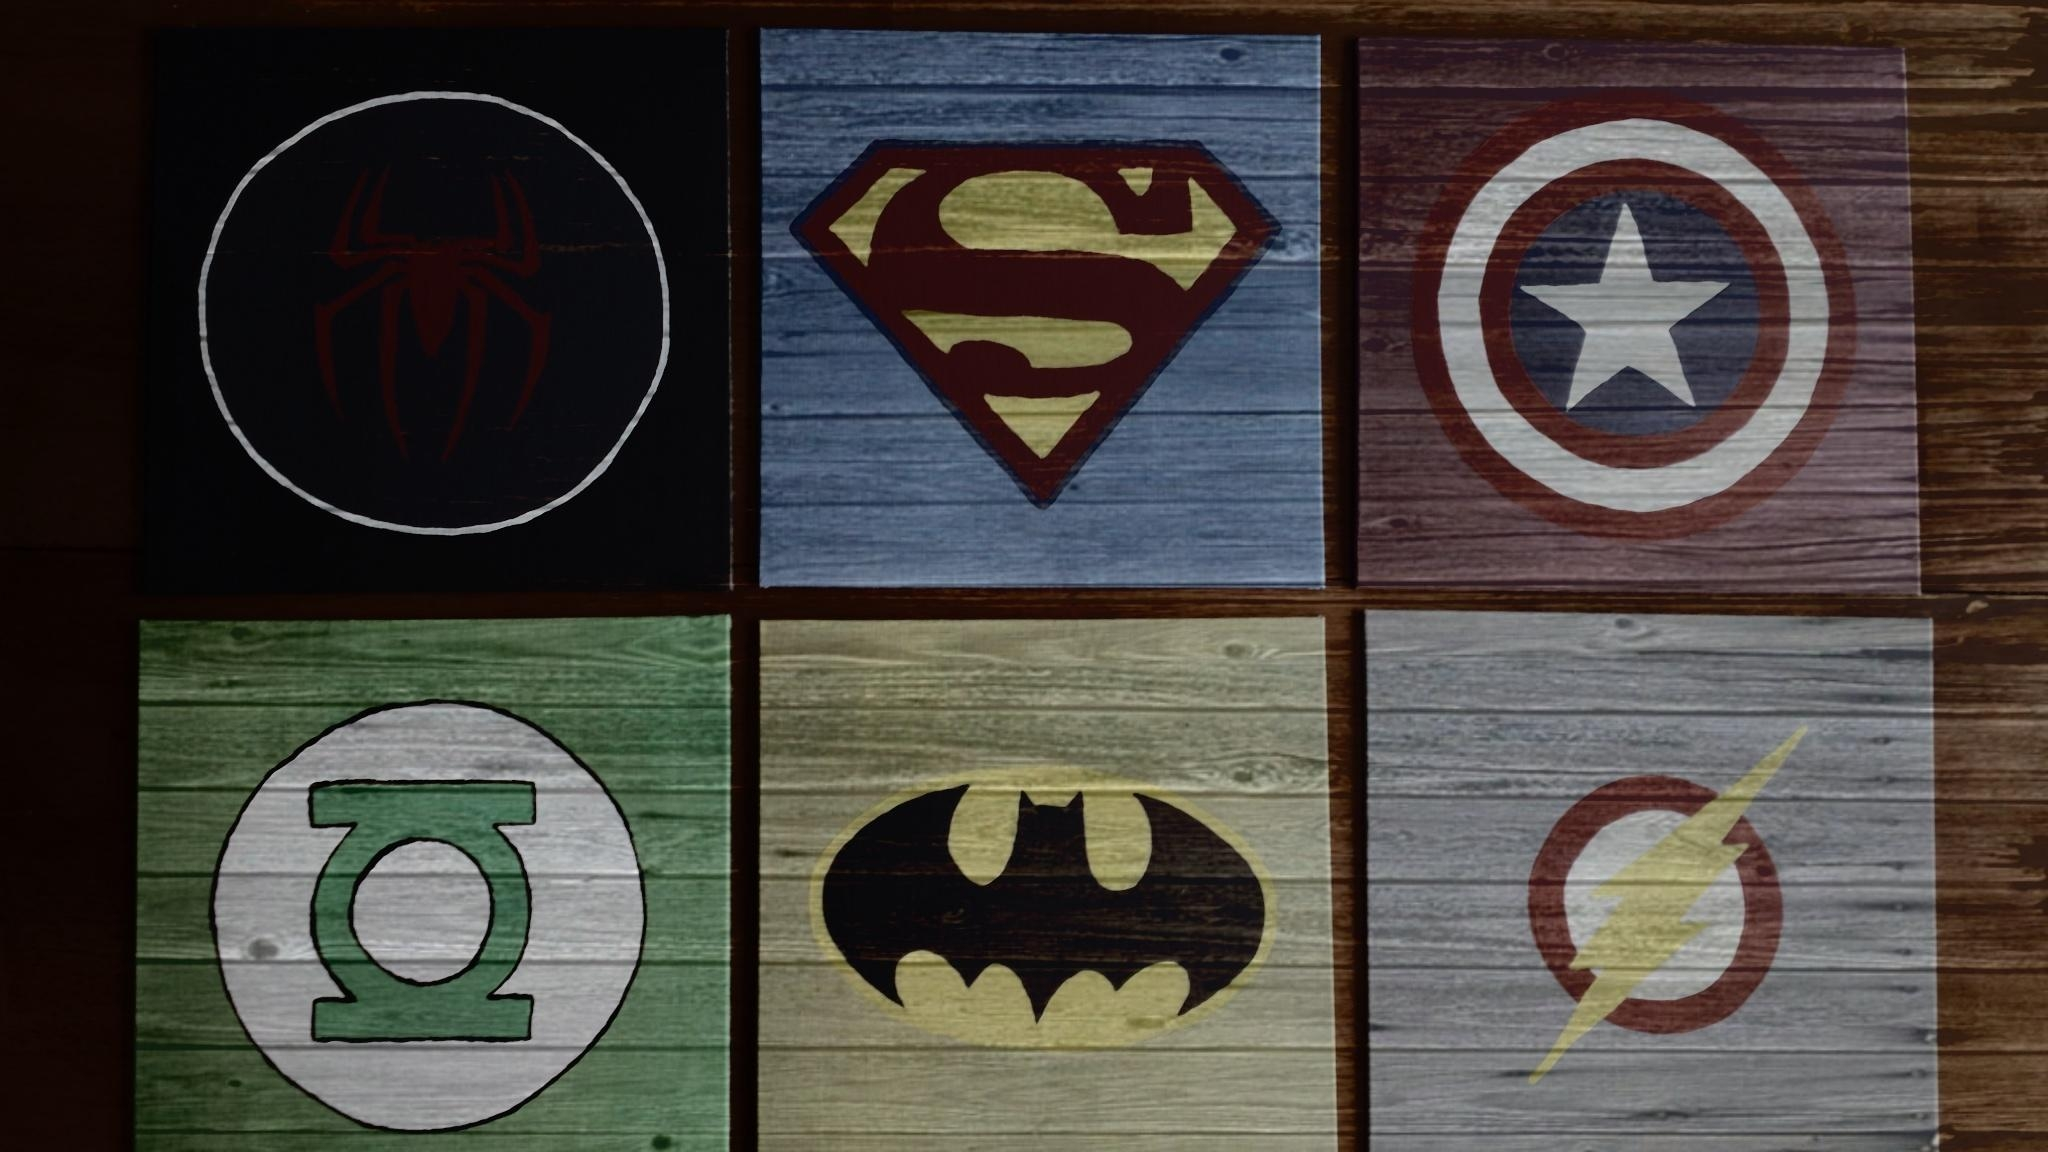 Diy Wall Art For Boys  Superhero Logos | Pinterest Inspiration With Superhero Wall Art For Kids (Image 4 of 20)